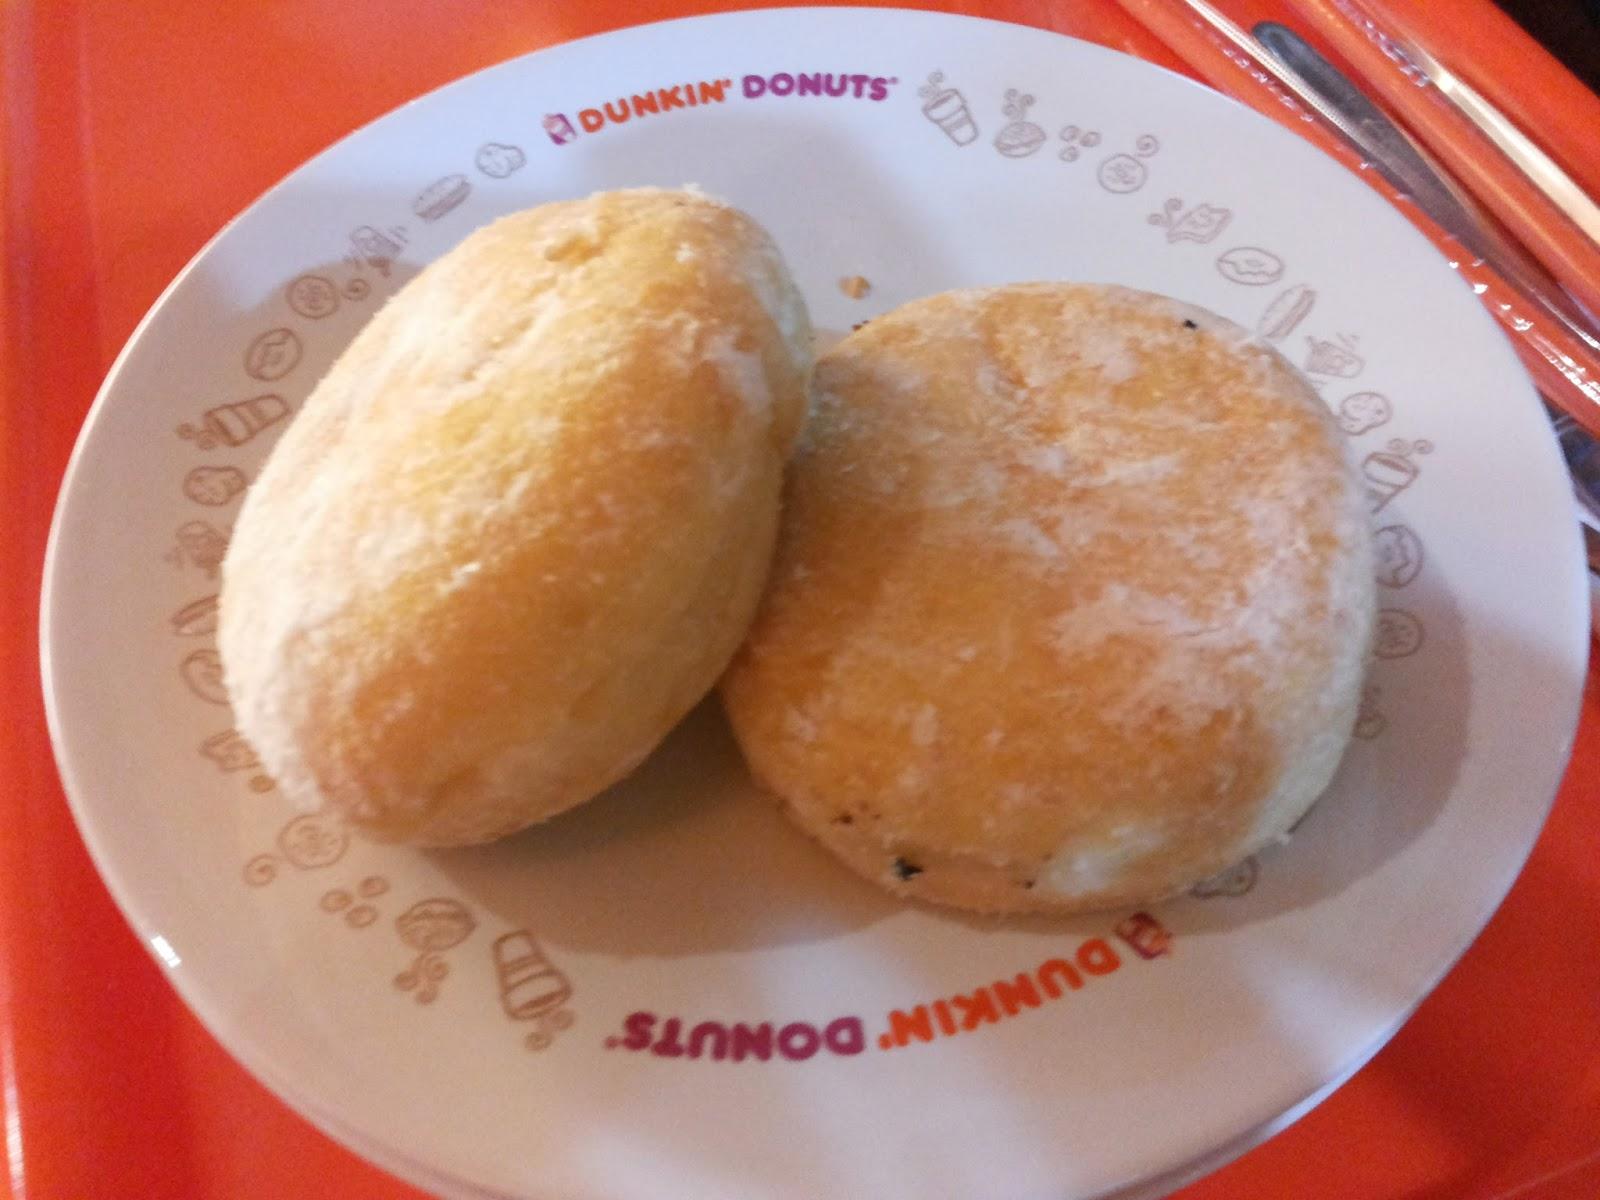 Dunkin Donuts Rasa Durian pandamakan.blogspot.com